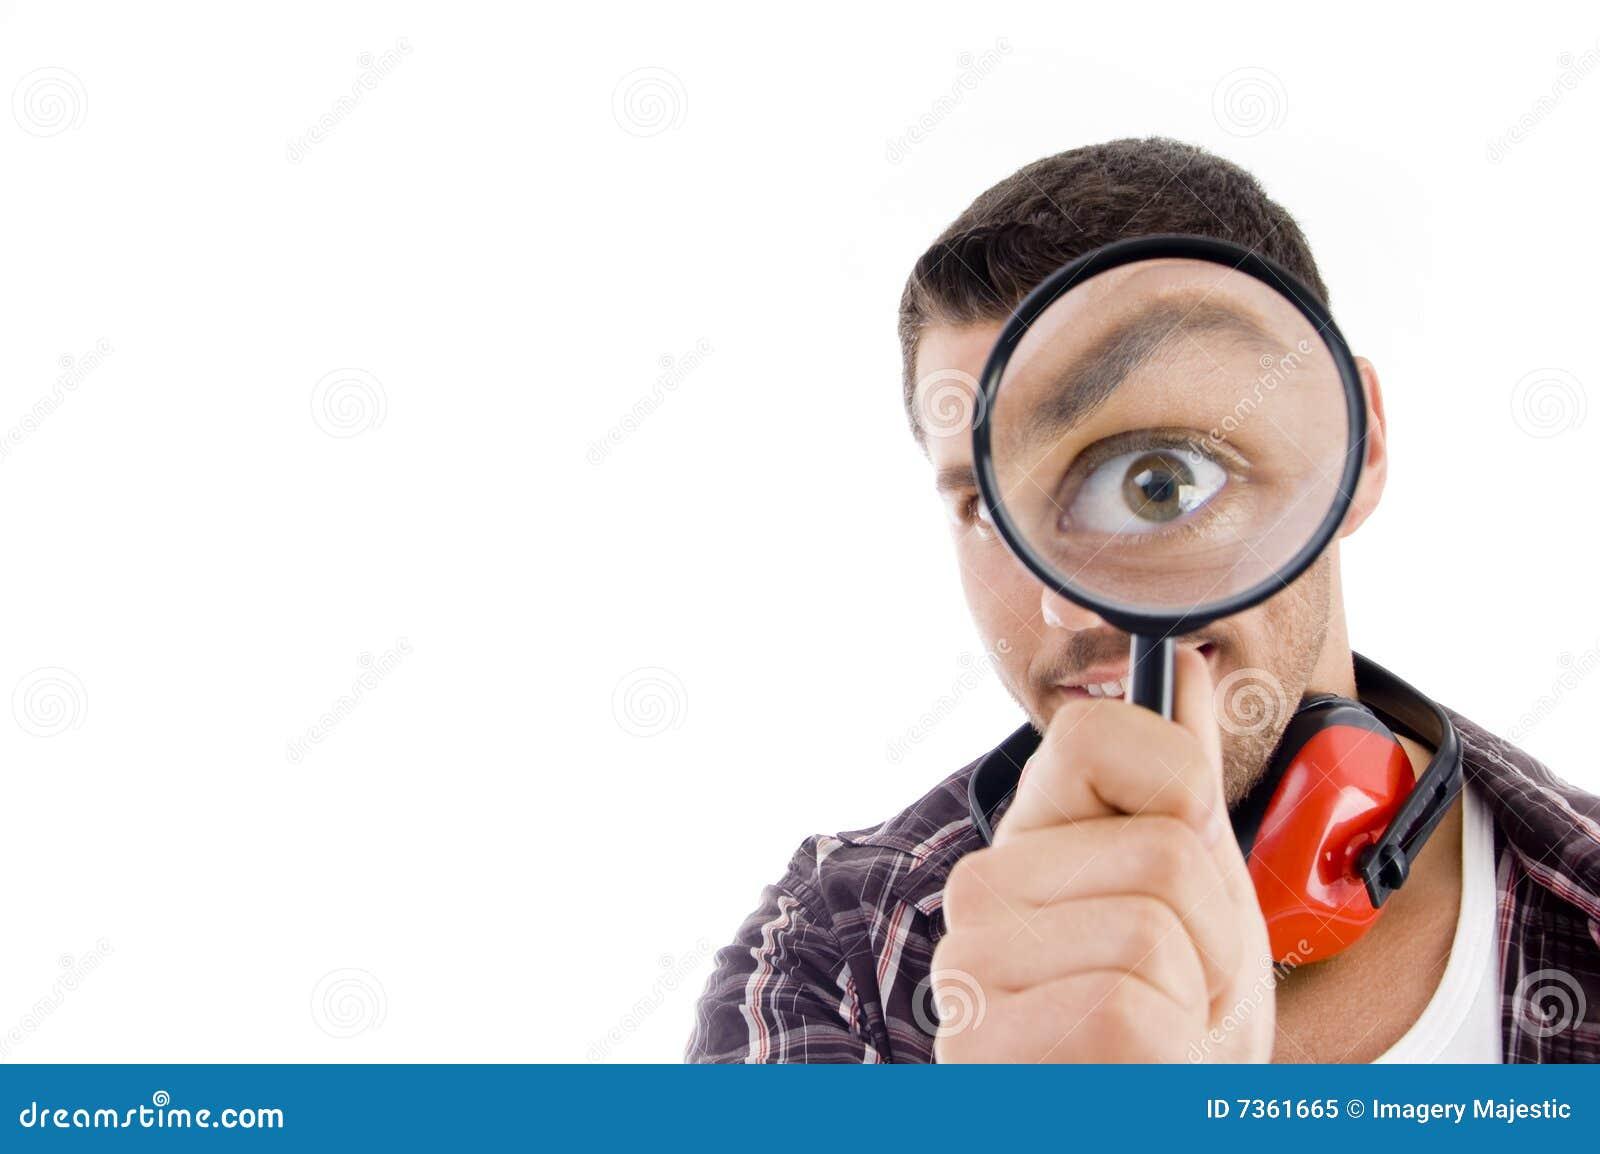 Man Looking Through Magnifying Glass Royalty Free Stock